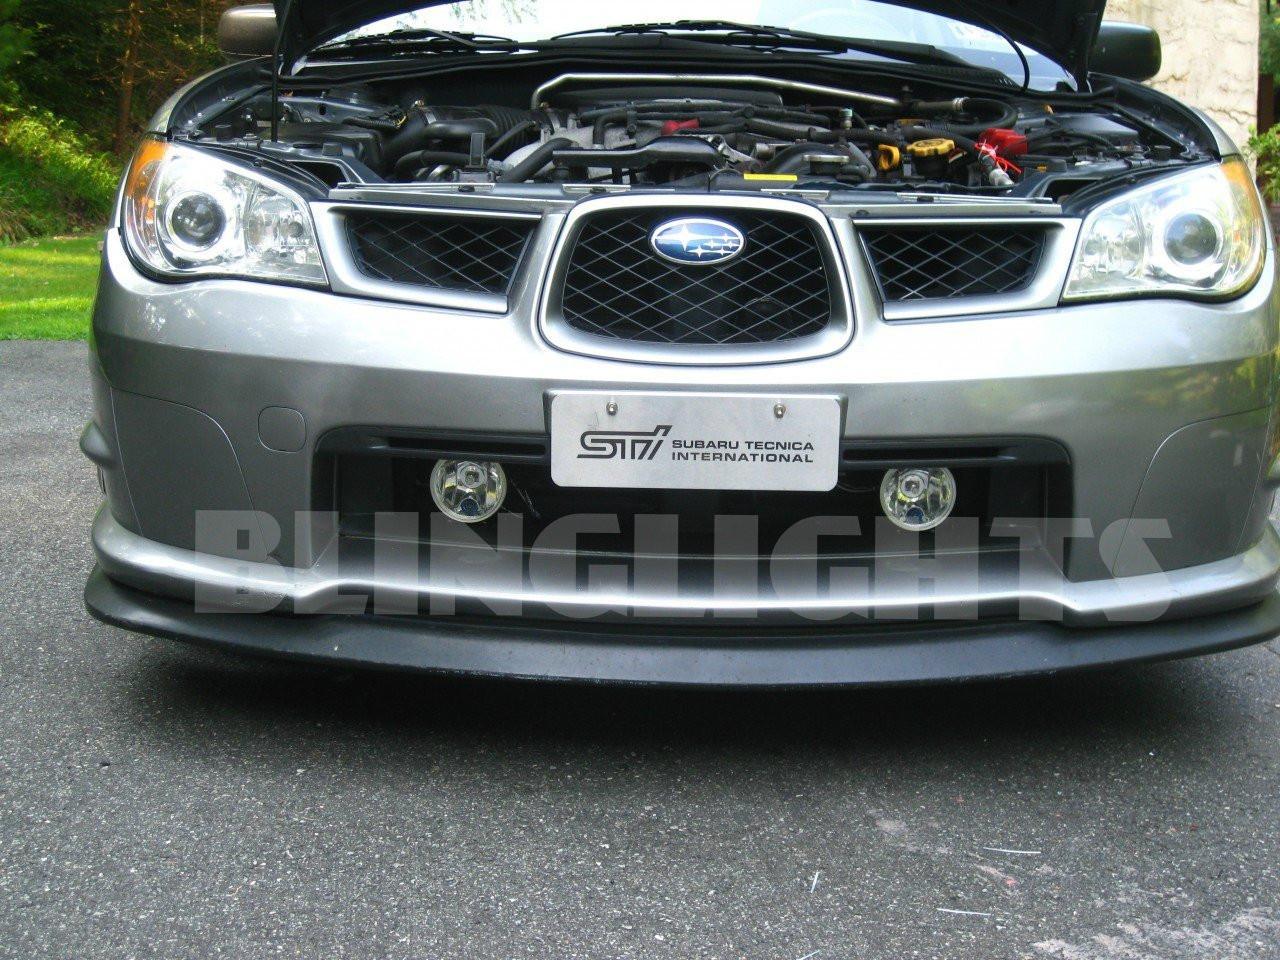 small resolution of subaru impreza wrx sti grille xenon fog lamps lights kit blinglights com